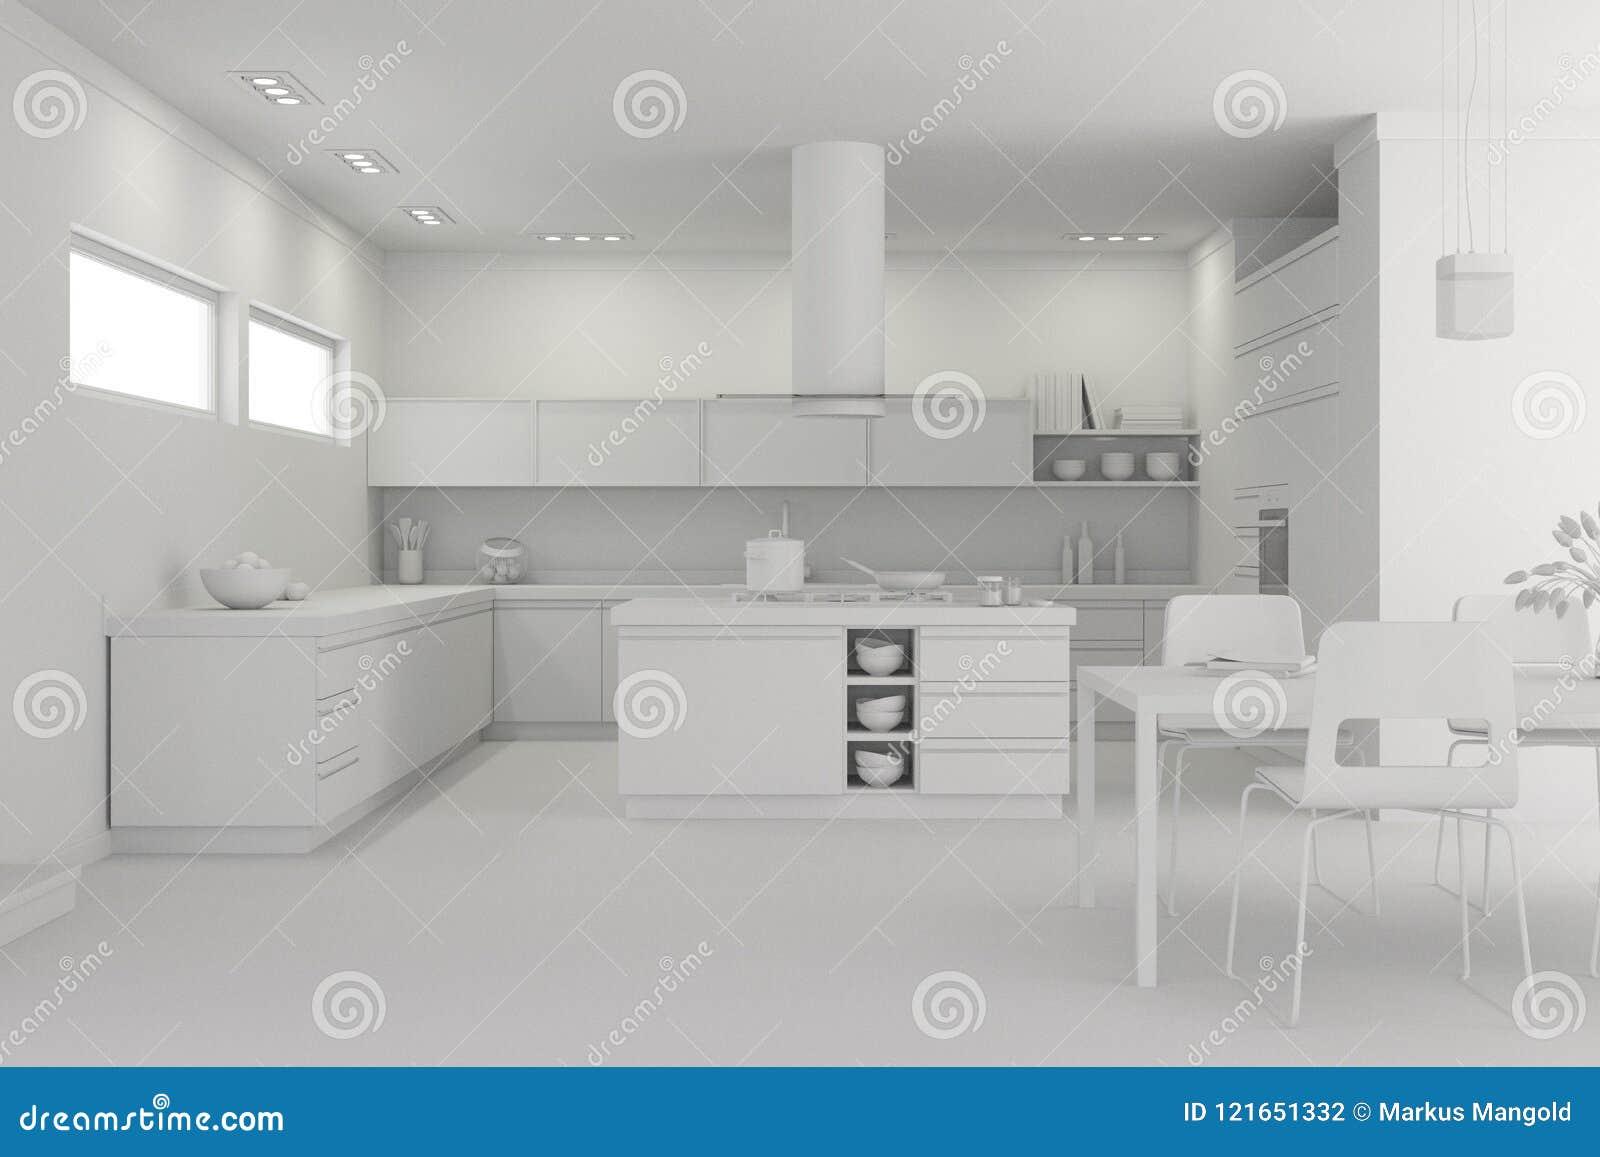 Interior Design Modern Kitchen Model Stock Illustration